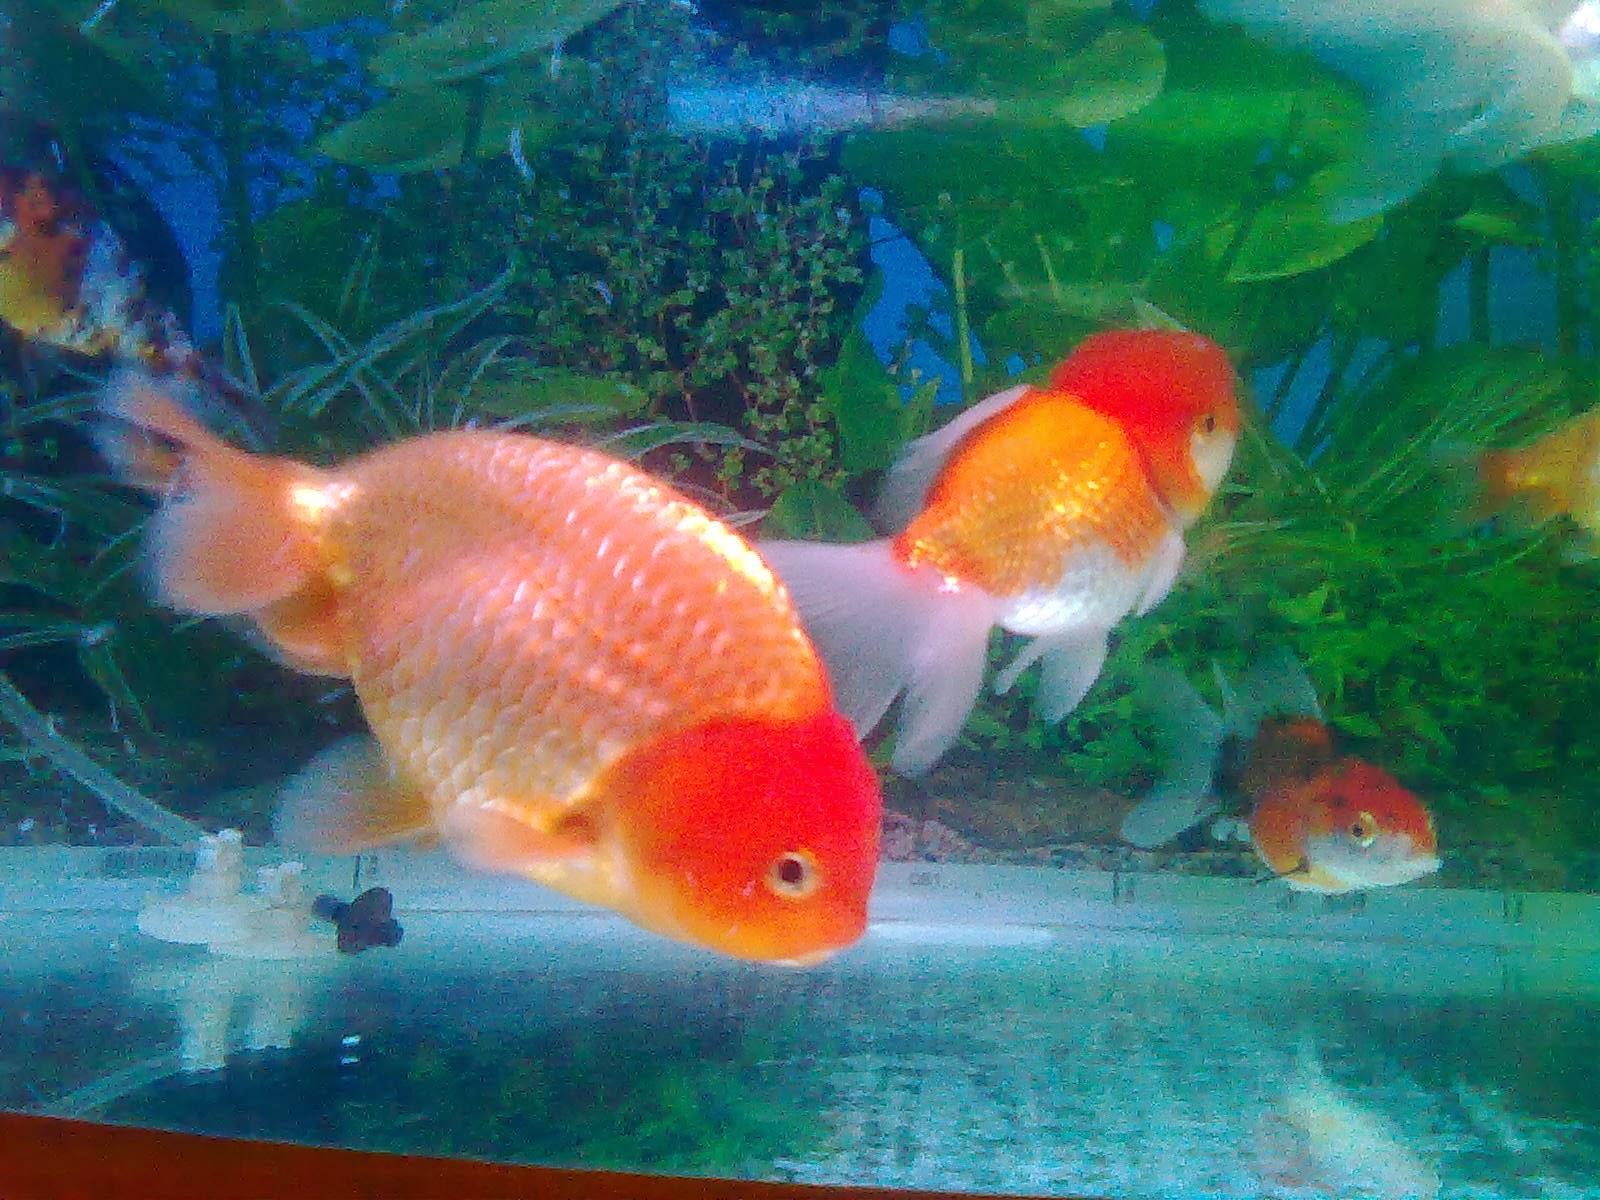 gambar ikan koki untuk diwarnai